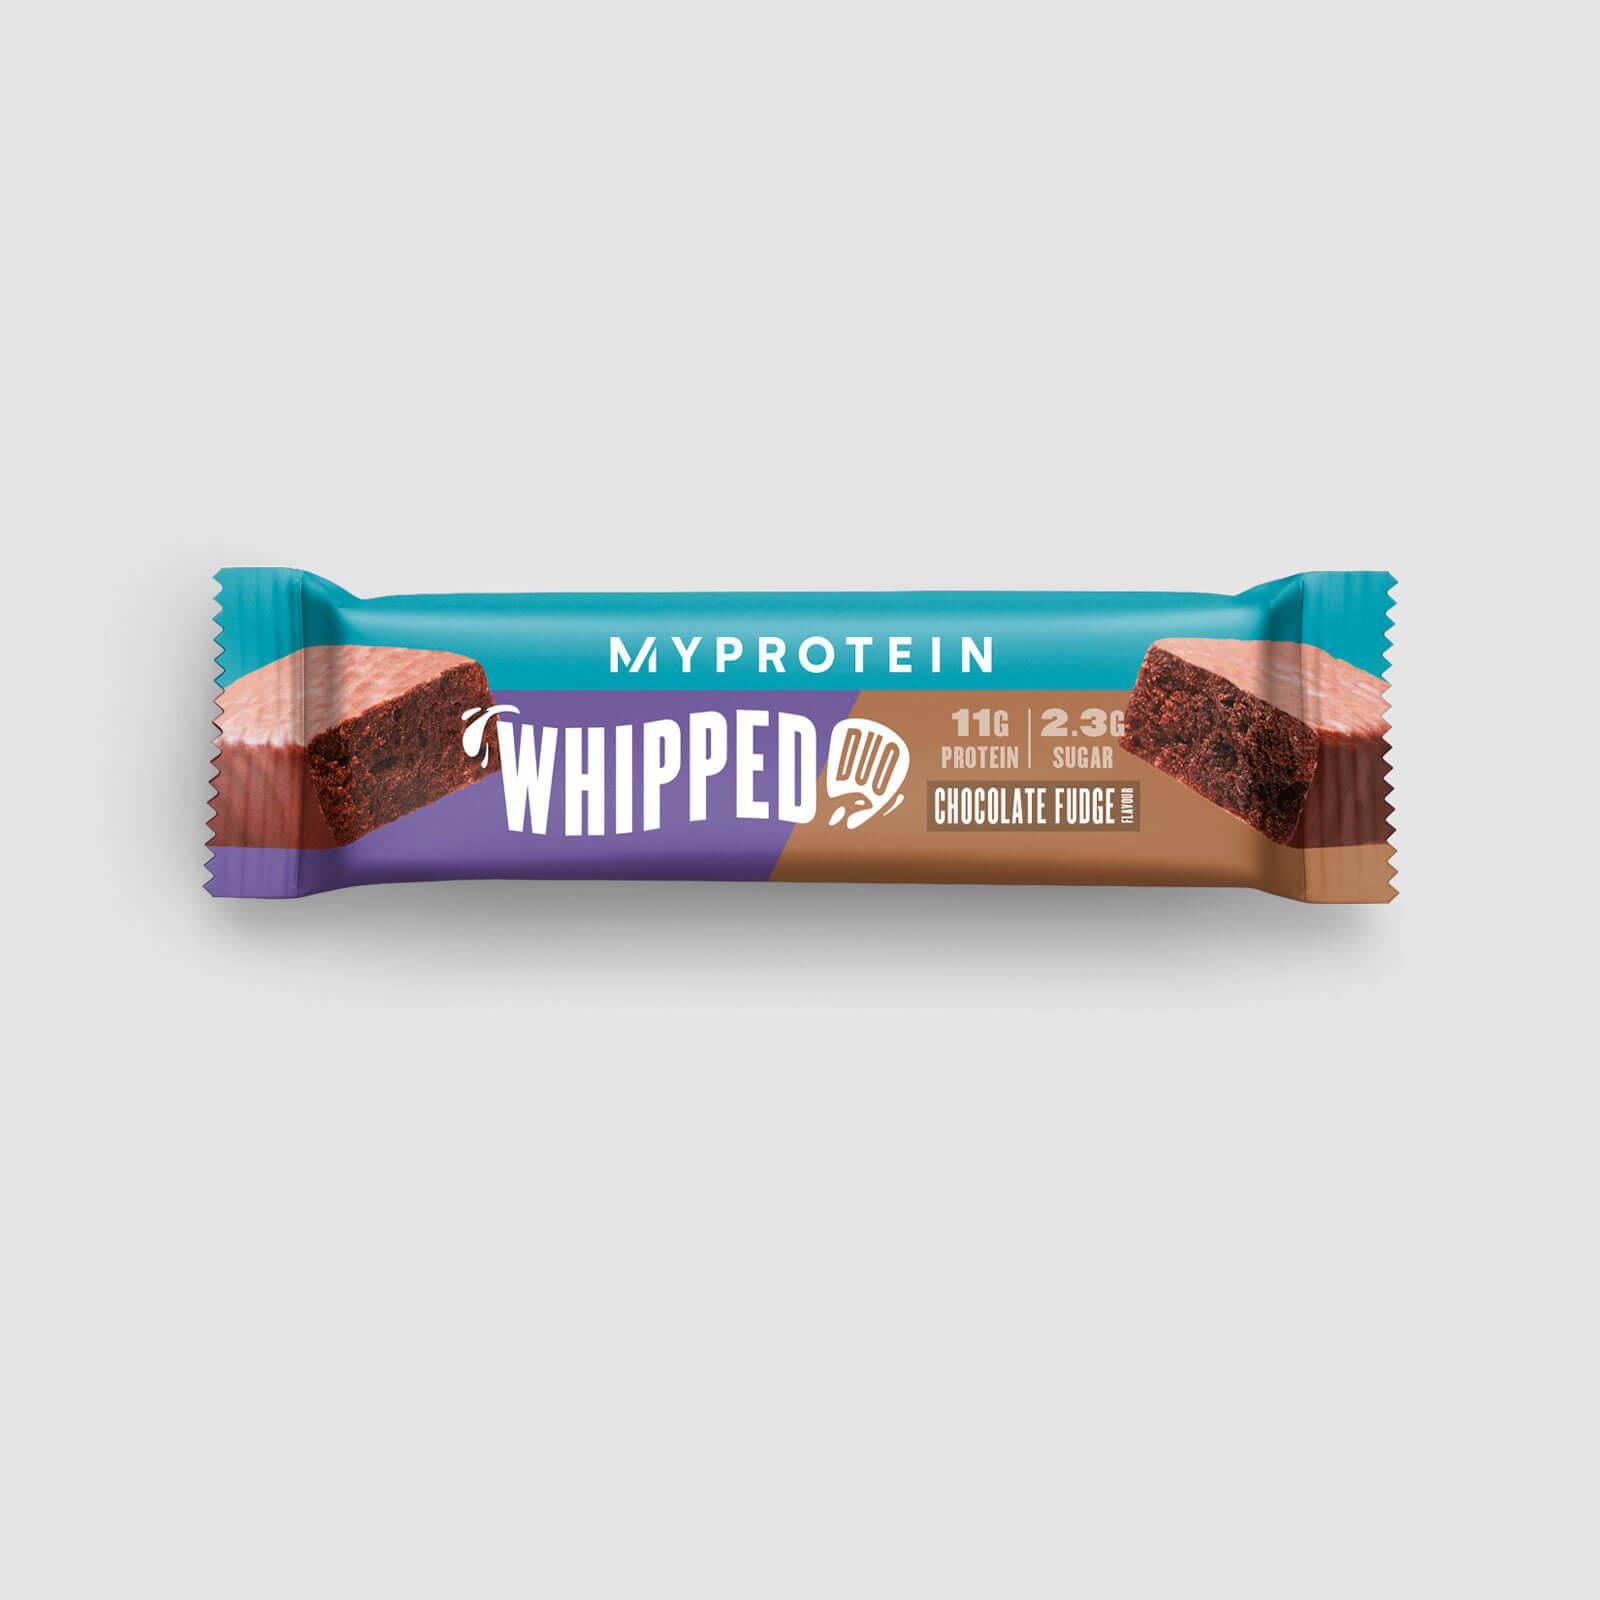 Myprotein Whipped Duo - Barre protéinée gourmande - 12 x 56g - Chocolate Fudge